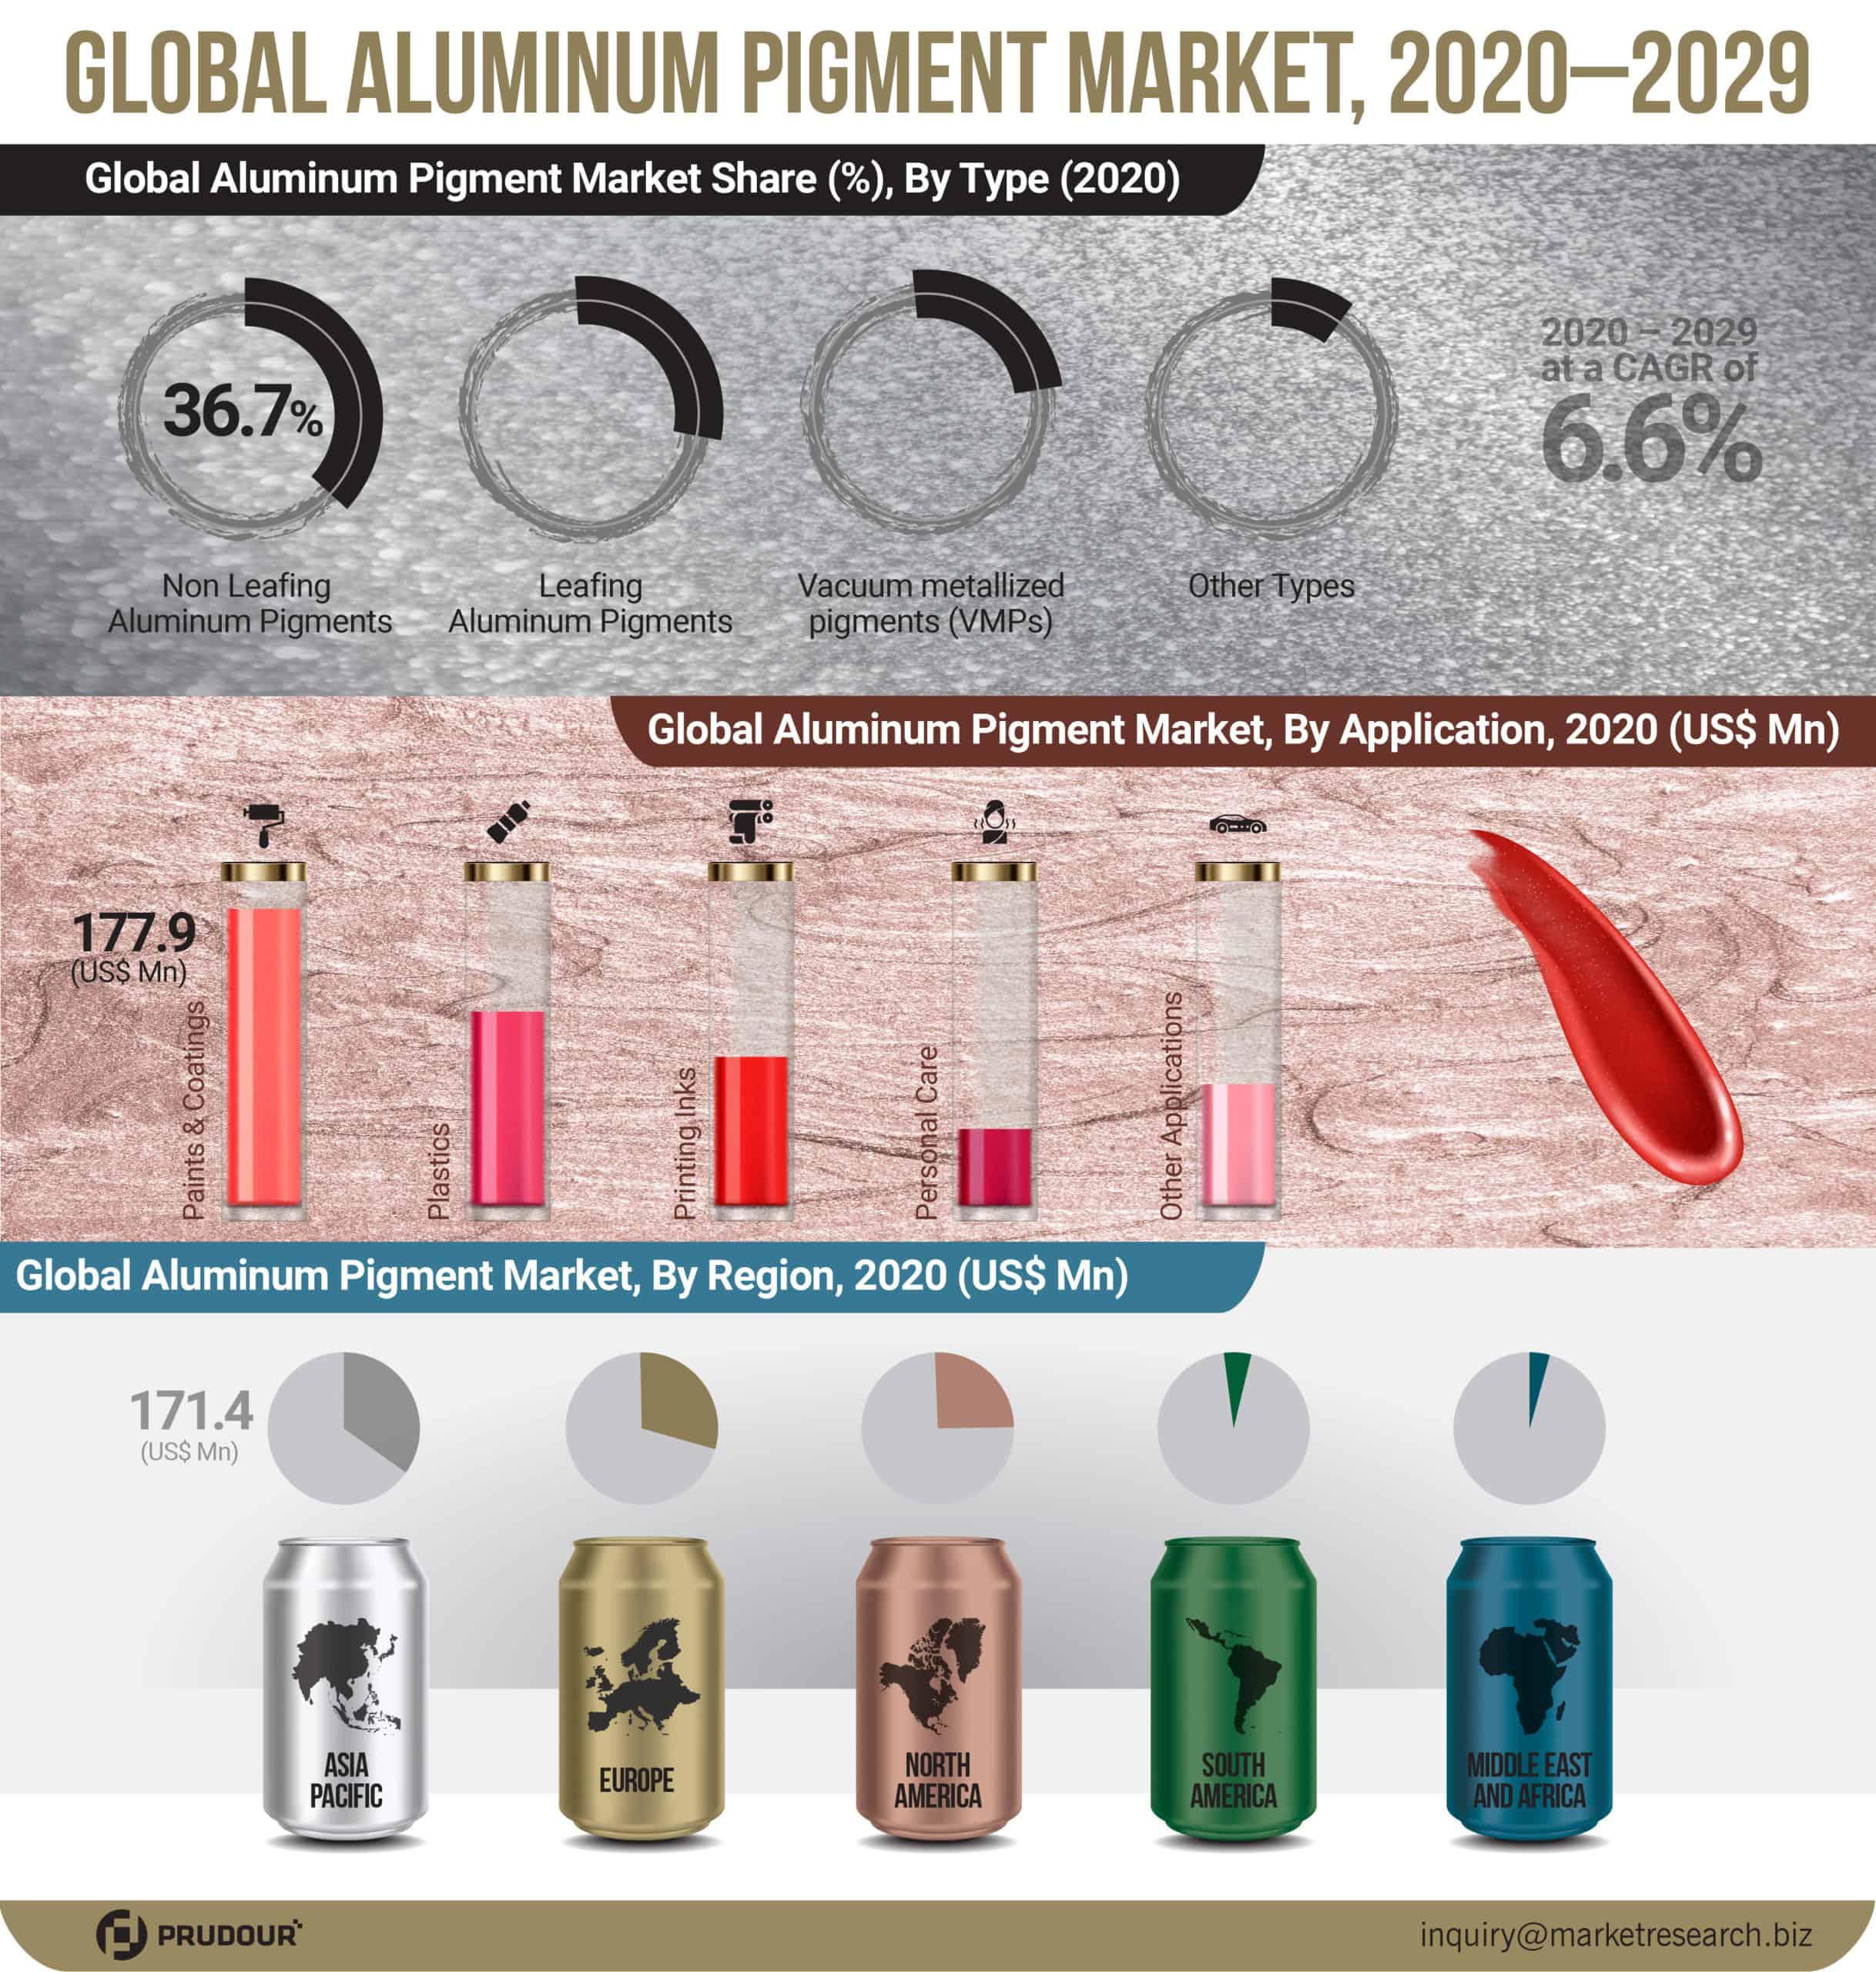 Global Aluminum Pigment Market